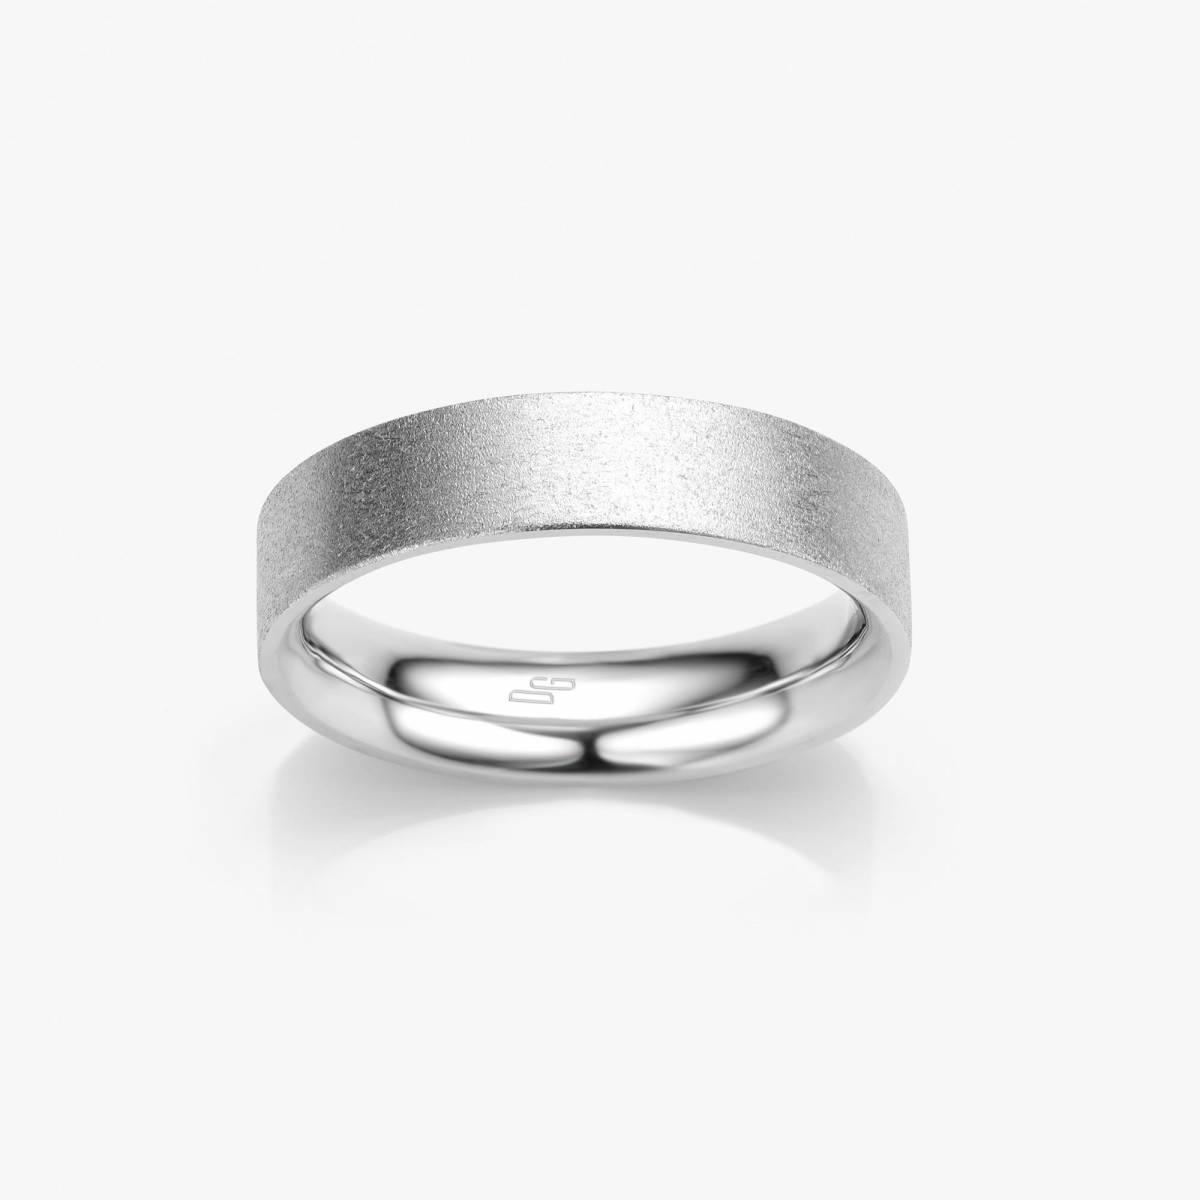 Maison De Greef - Juwelen - Brussel - Bruidsjuwelen - Trouwring - Verlovingsring - House of Weddings - 3